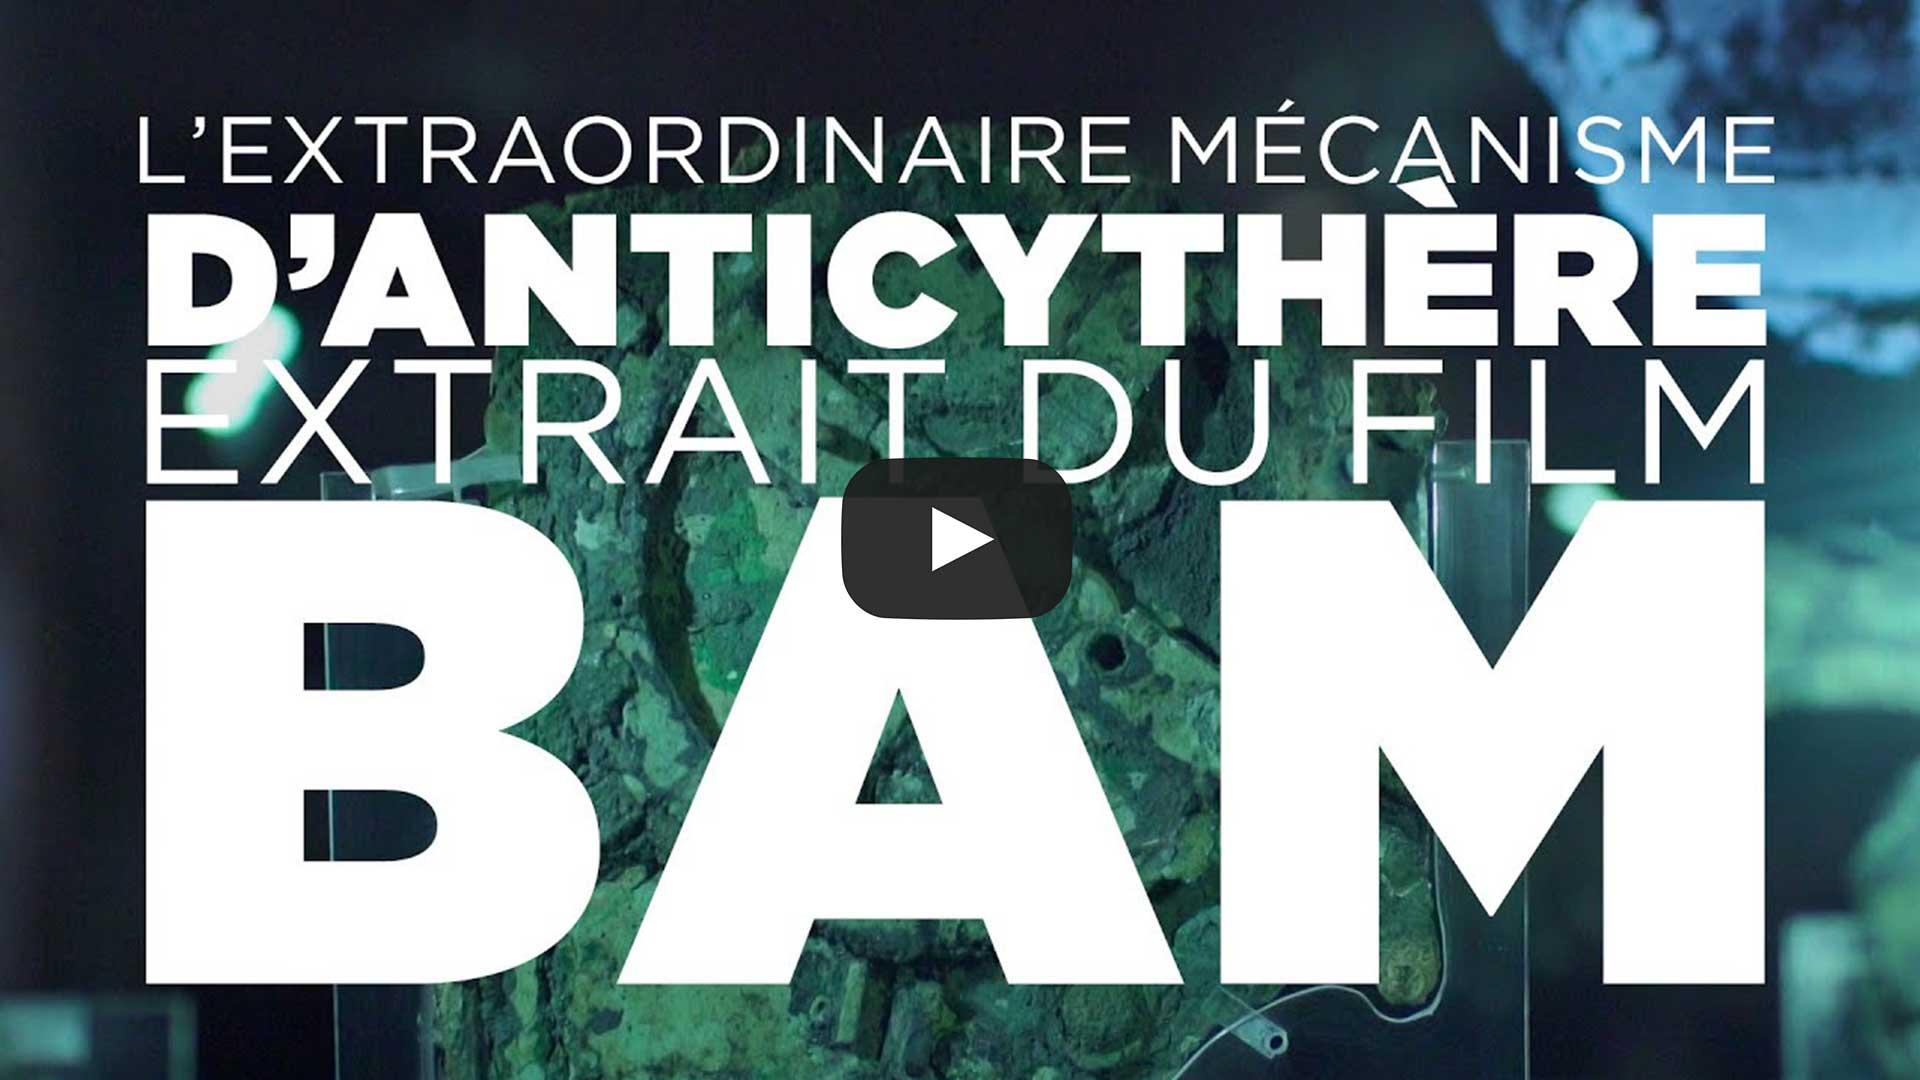 BAM-machine-anticythere-lrdp